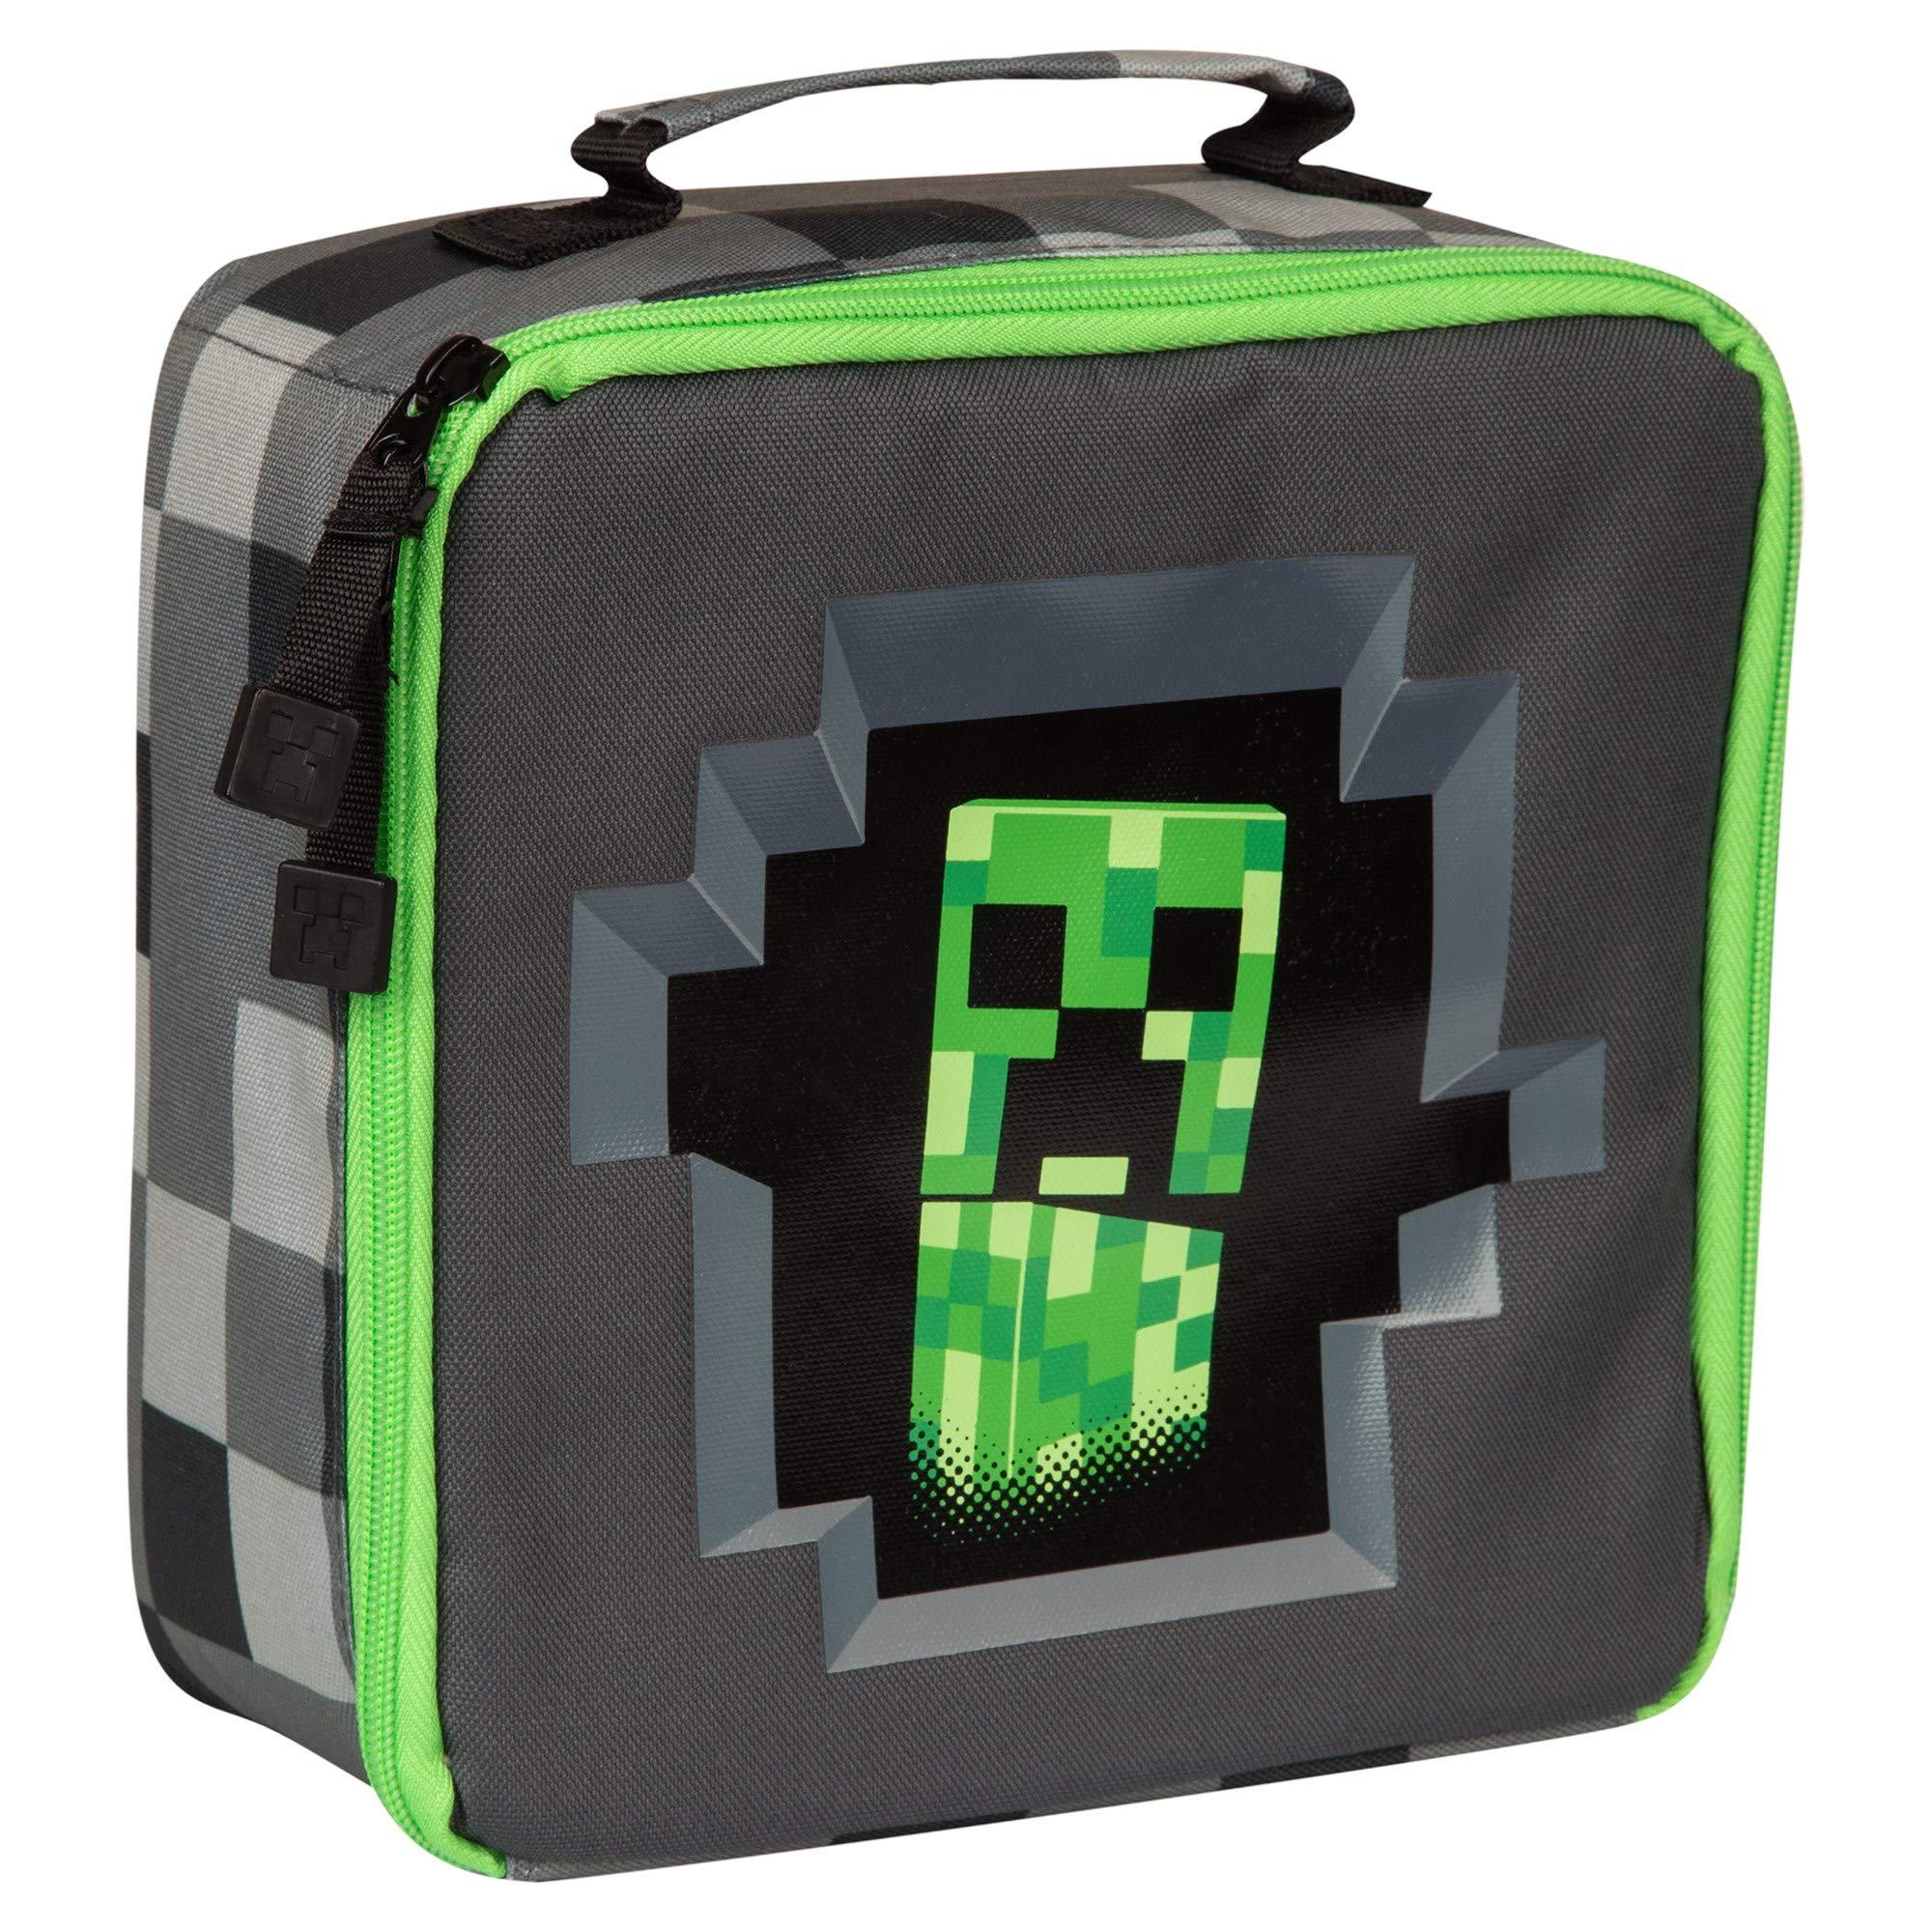 JINX Minecraft Creepy Creeper Insulated Kids School Lunch Box, Gray/Black, 8.5 inch x 8.5 inch x 4 inch by JINX